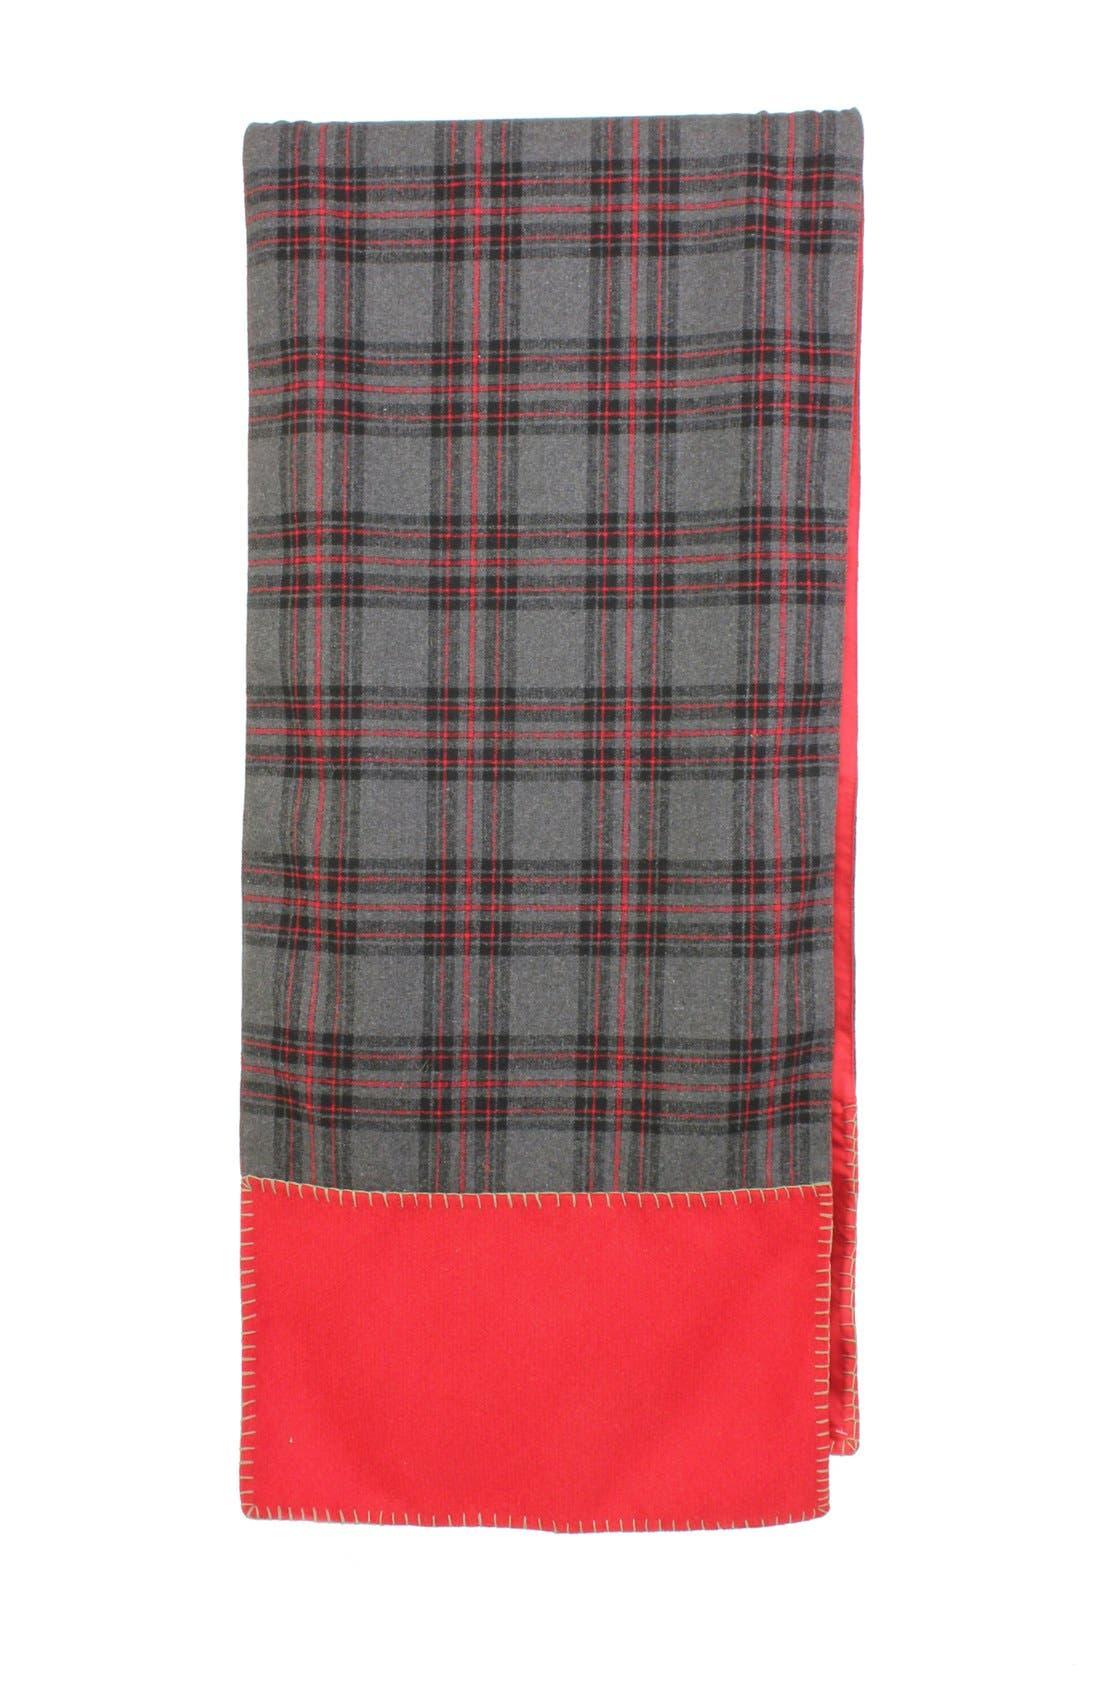 Main Image - Sage & Co. Plaid Wool Table Runner